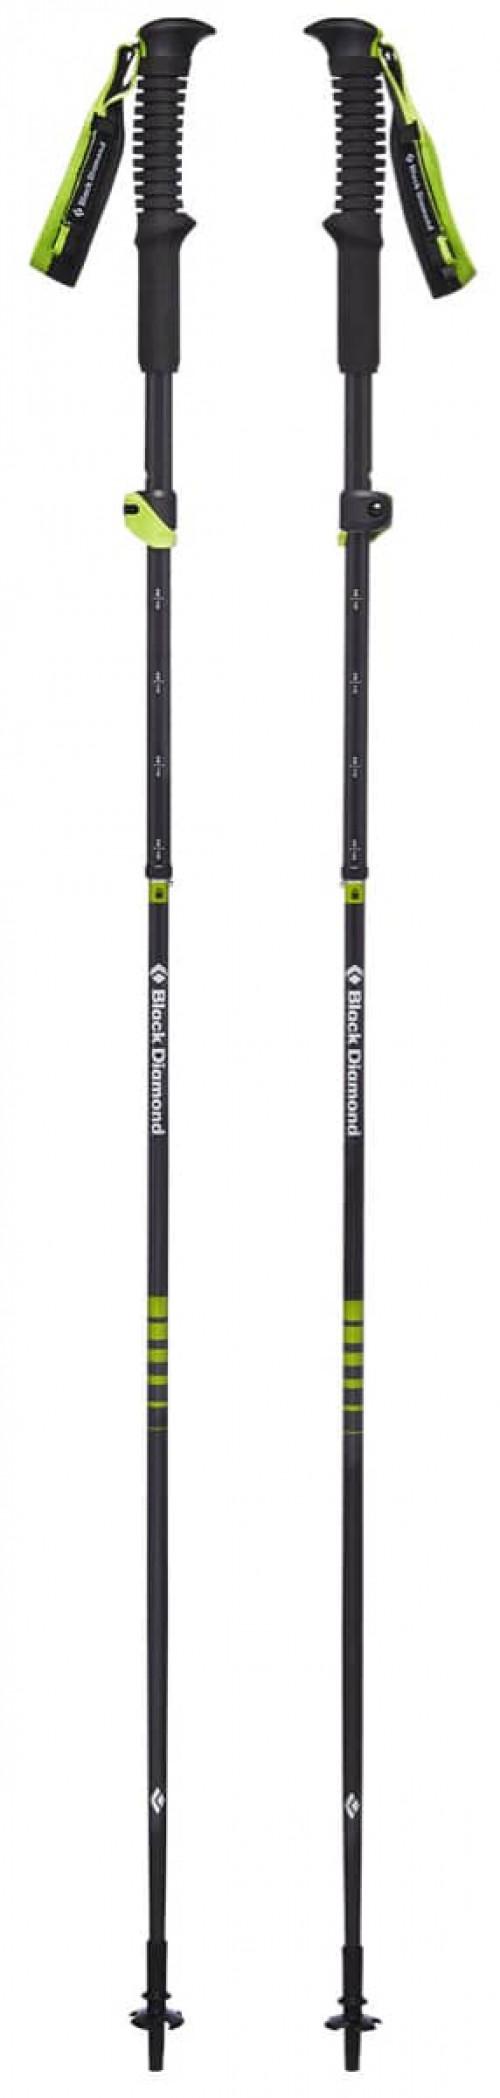 Black Diamond Distance Carbon Z Acc-Ready Pole Wasabi